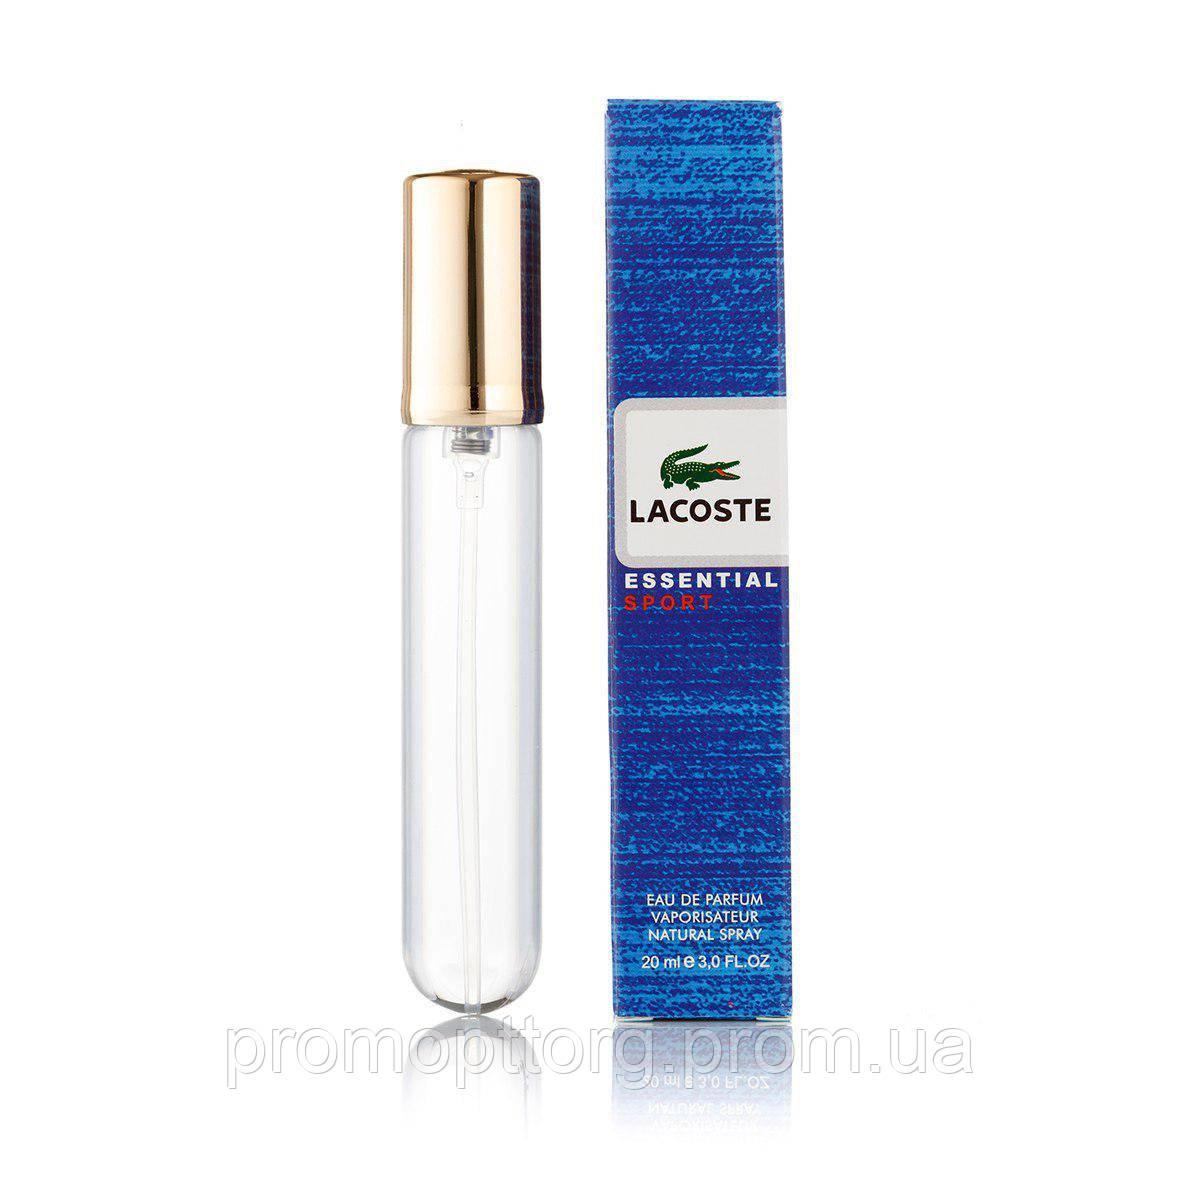 Мужской мини парфюм Lacoste Essential Sport 20 ml  (реплика)